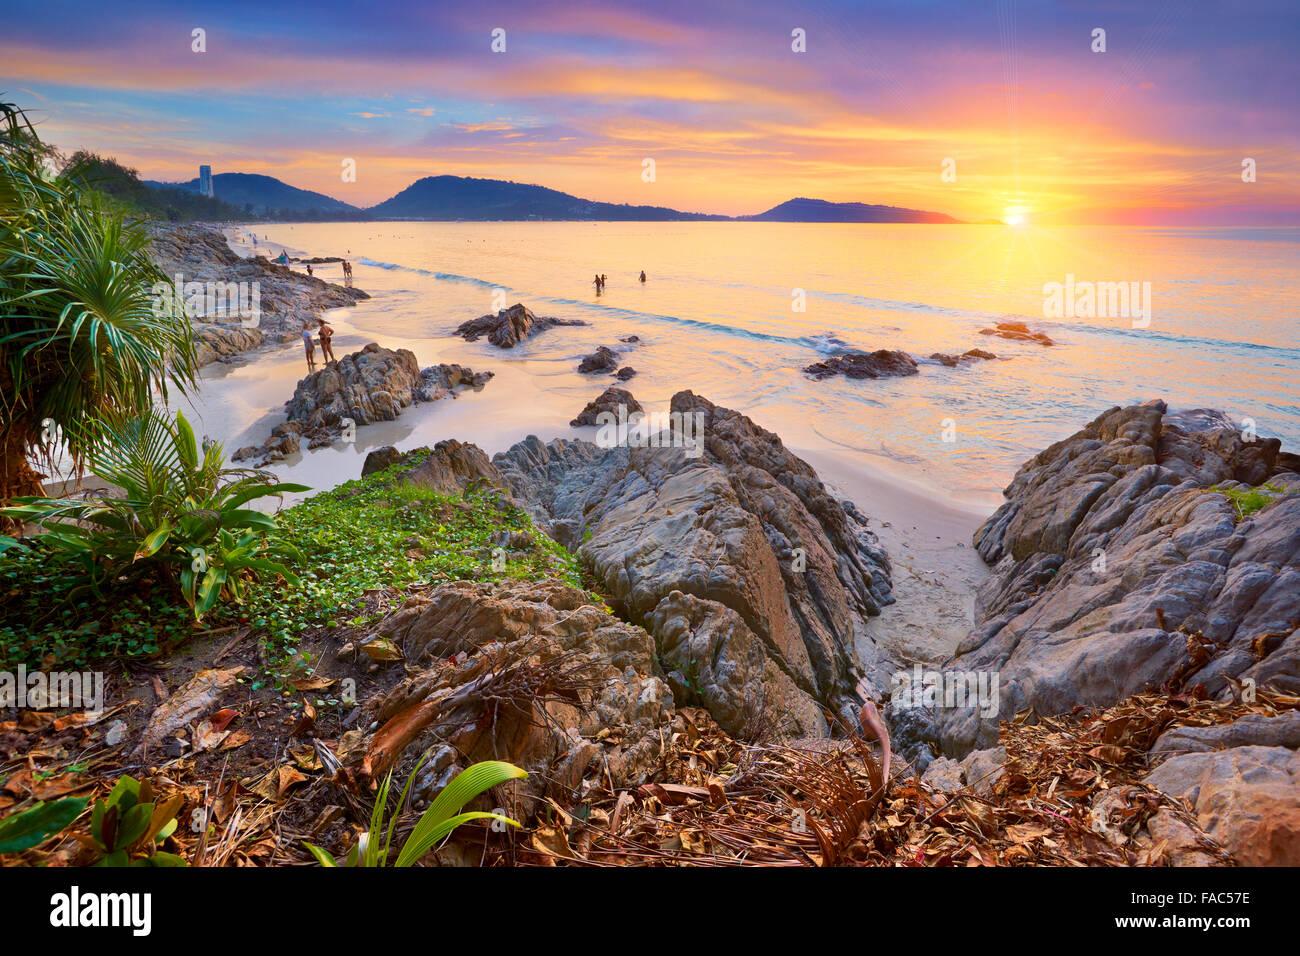 Thailand - tropical Phuket Island, Patong Beach, sunset time scenery - Stock Image